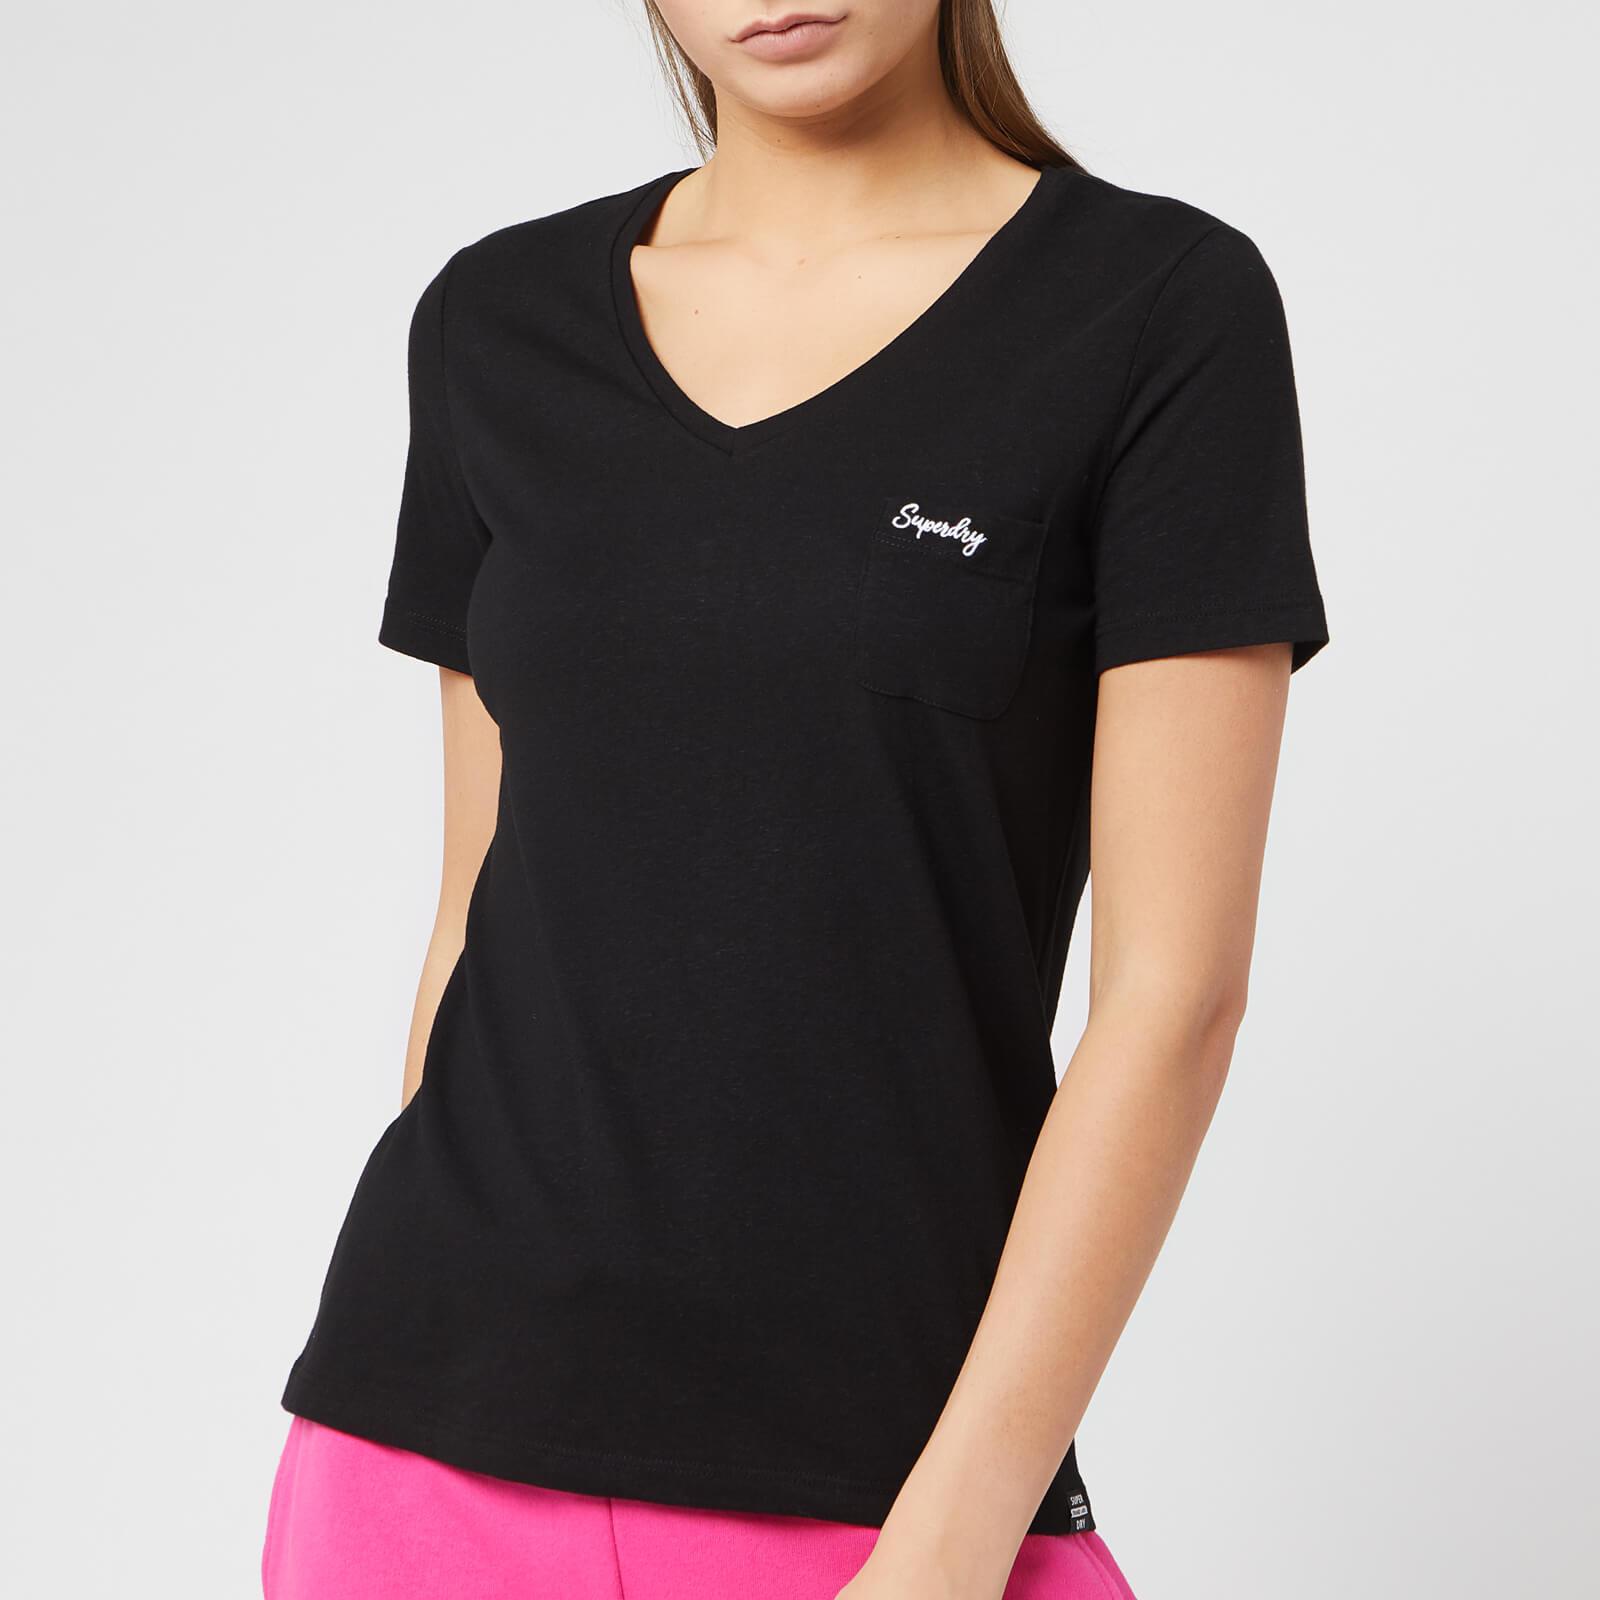 Superdry Women's Ol Essential Vee T-Shirt - Jet Black - UK 12 - Black